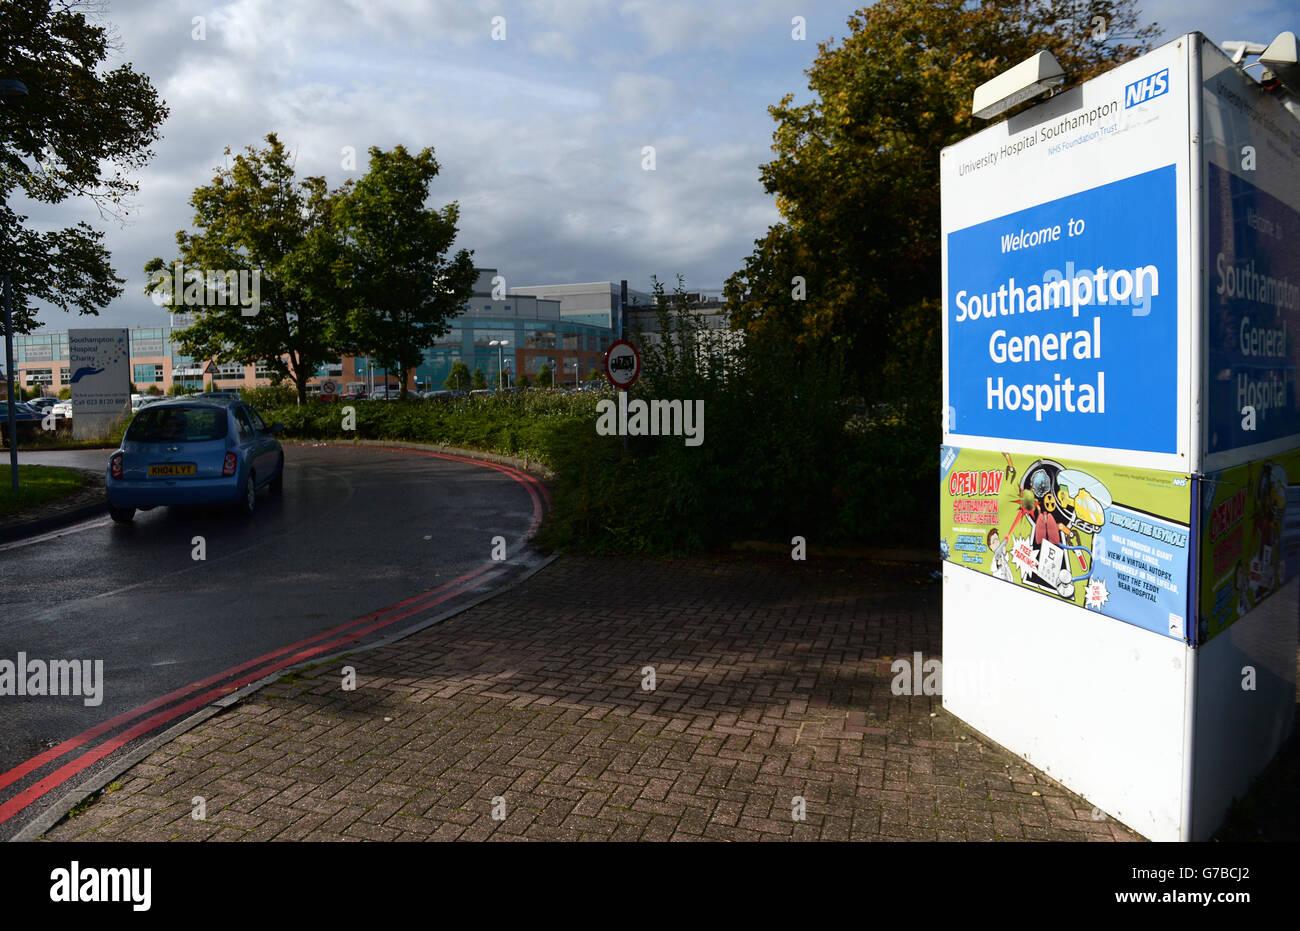 Hospital Stock - Southampton General Hospital - Stock Image